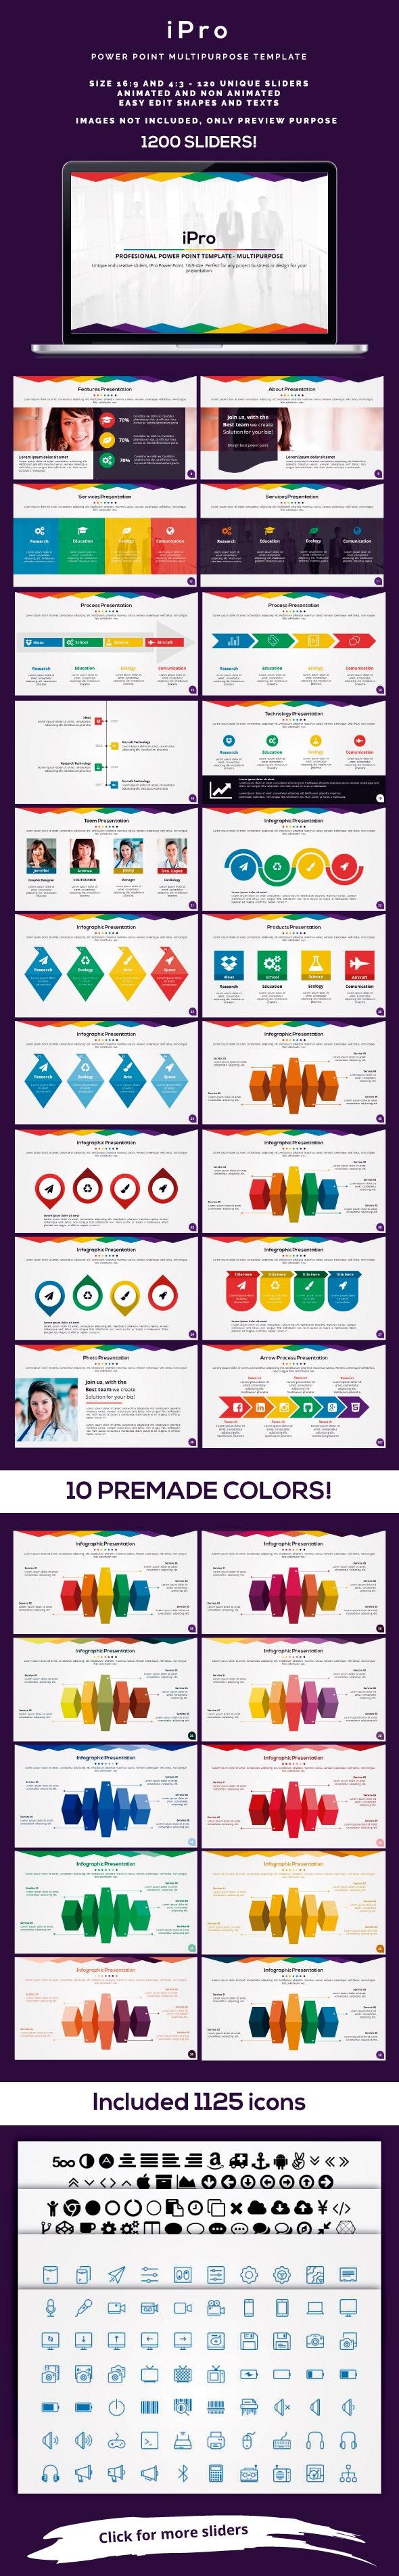 iPro Power Point - Creative PowerPoint Templates